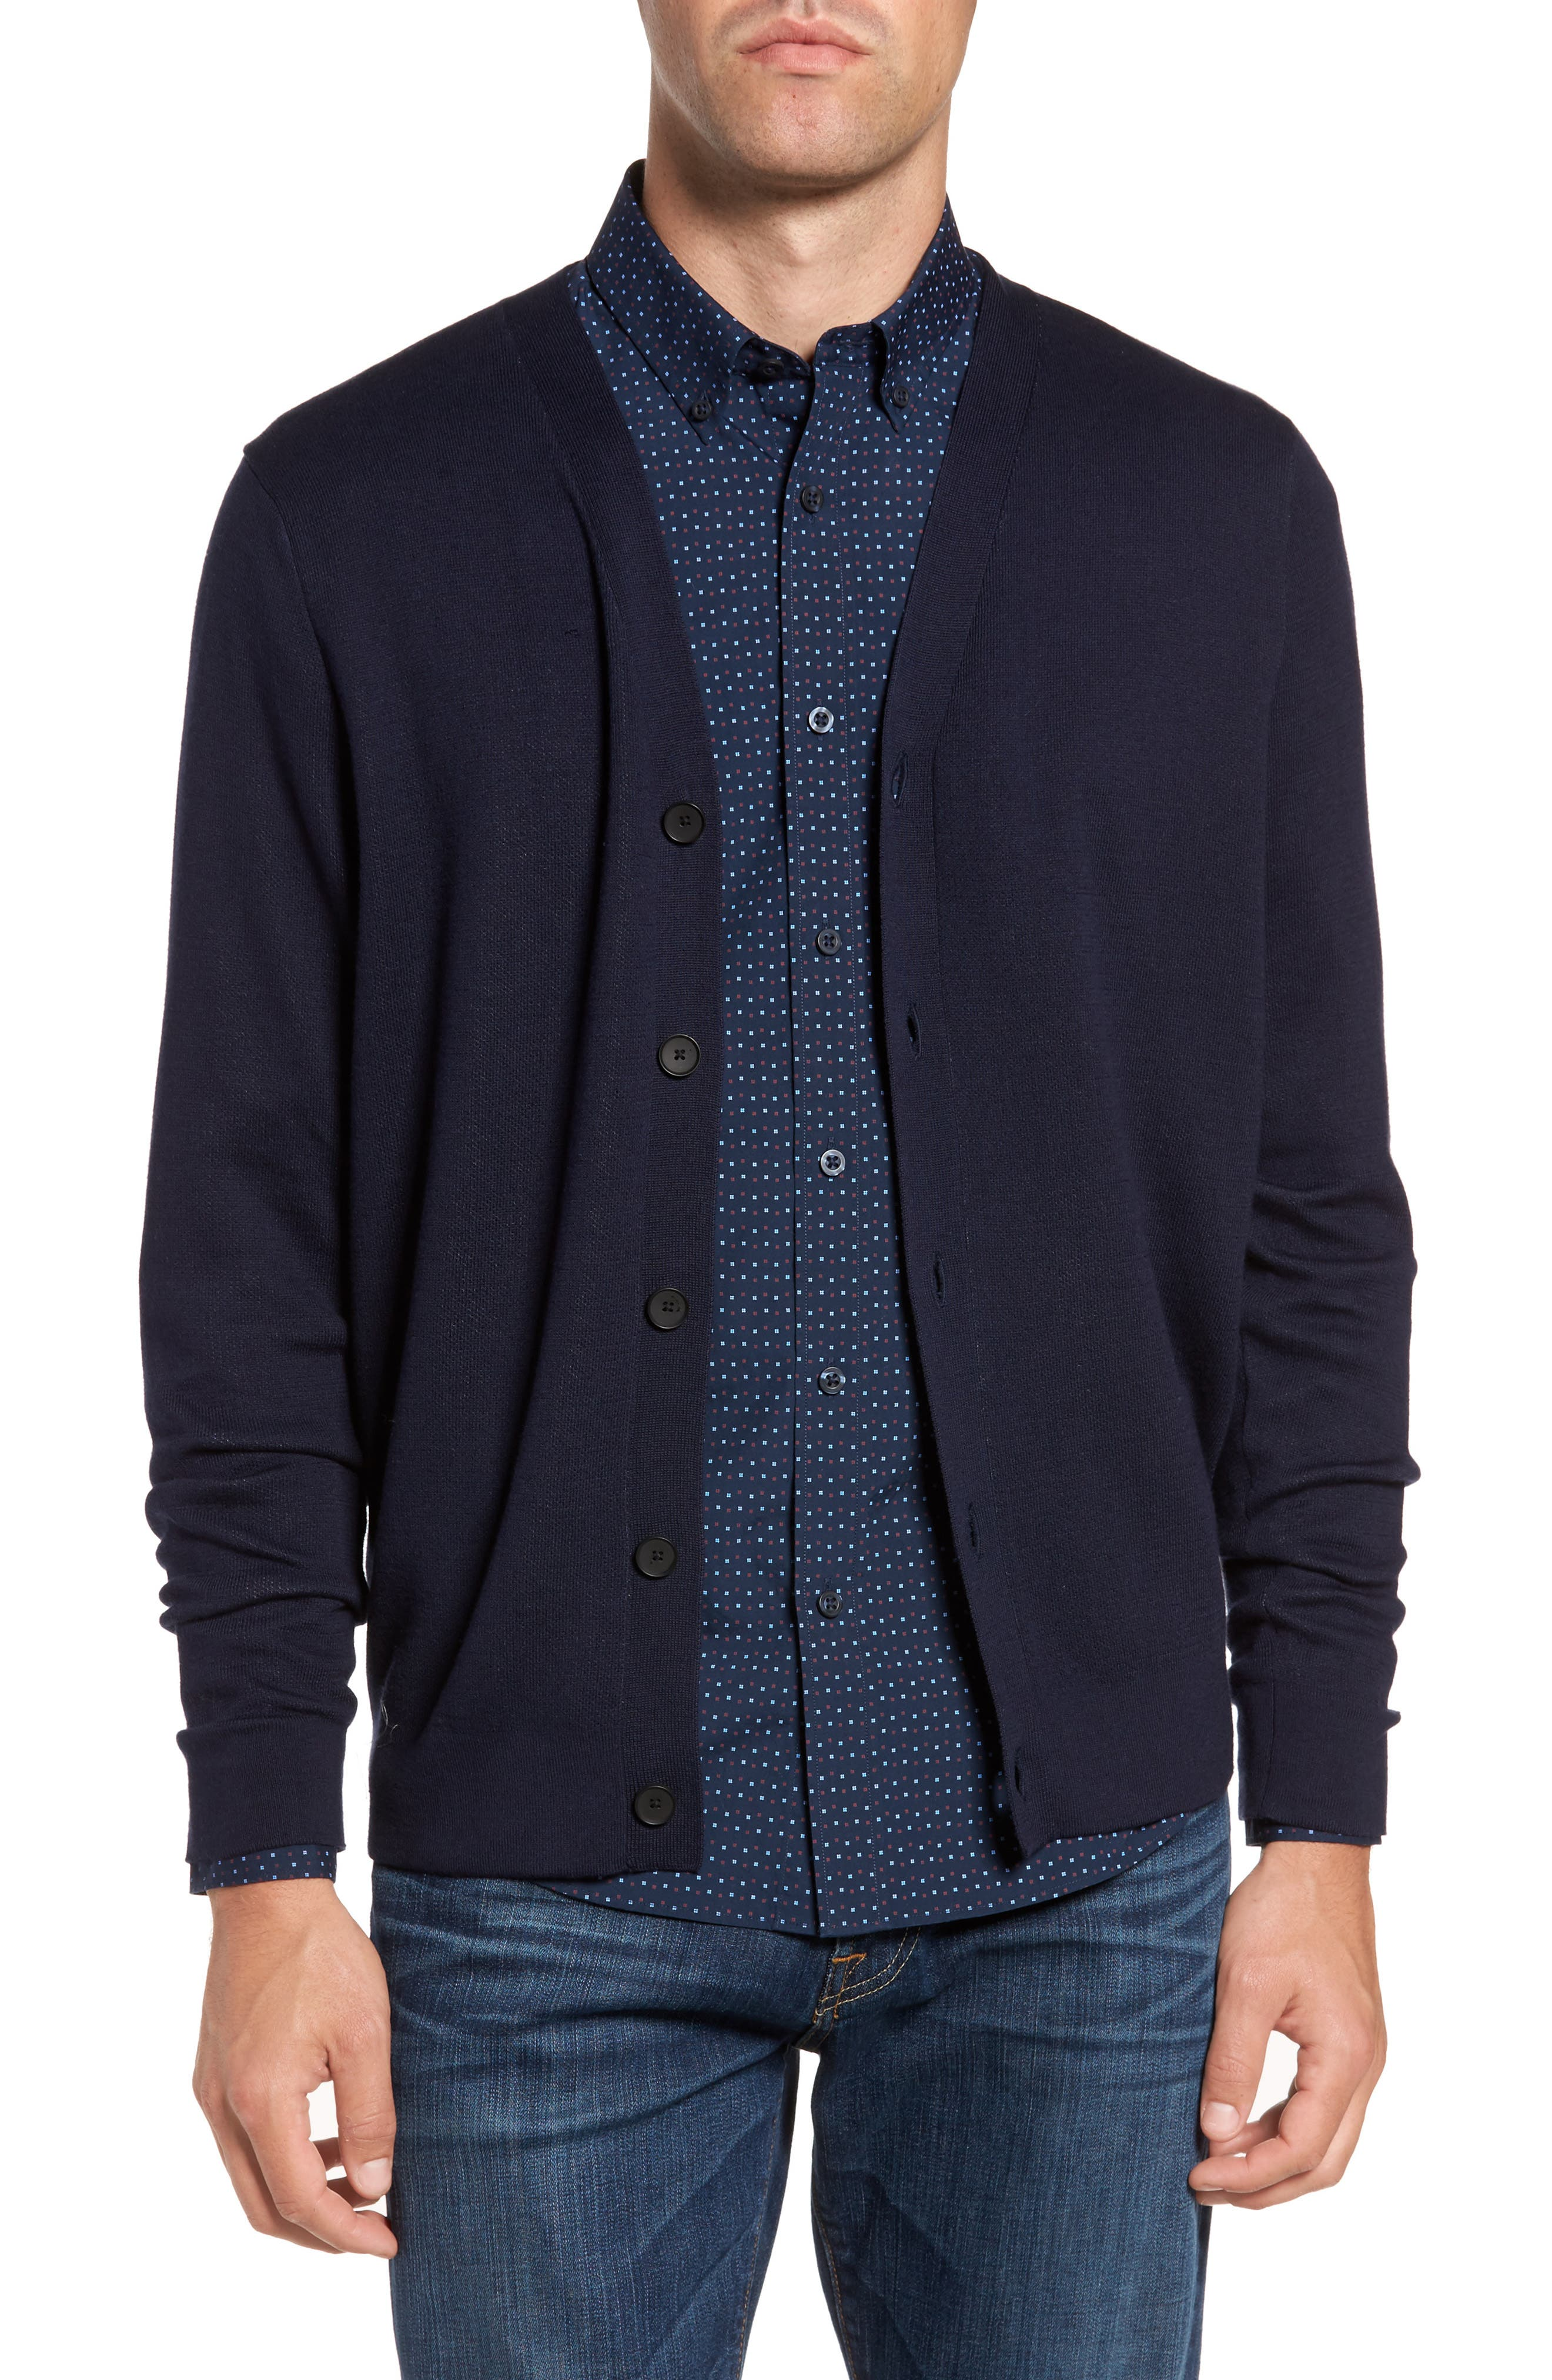 Main Image - Nordstrom Men's Shop Cotton Blend Cardigan